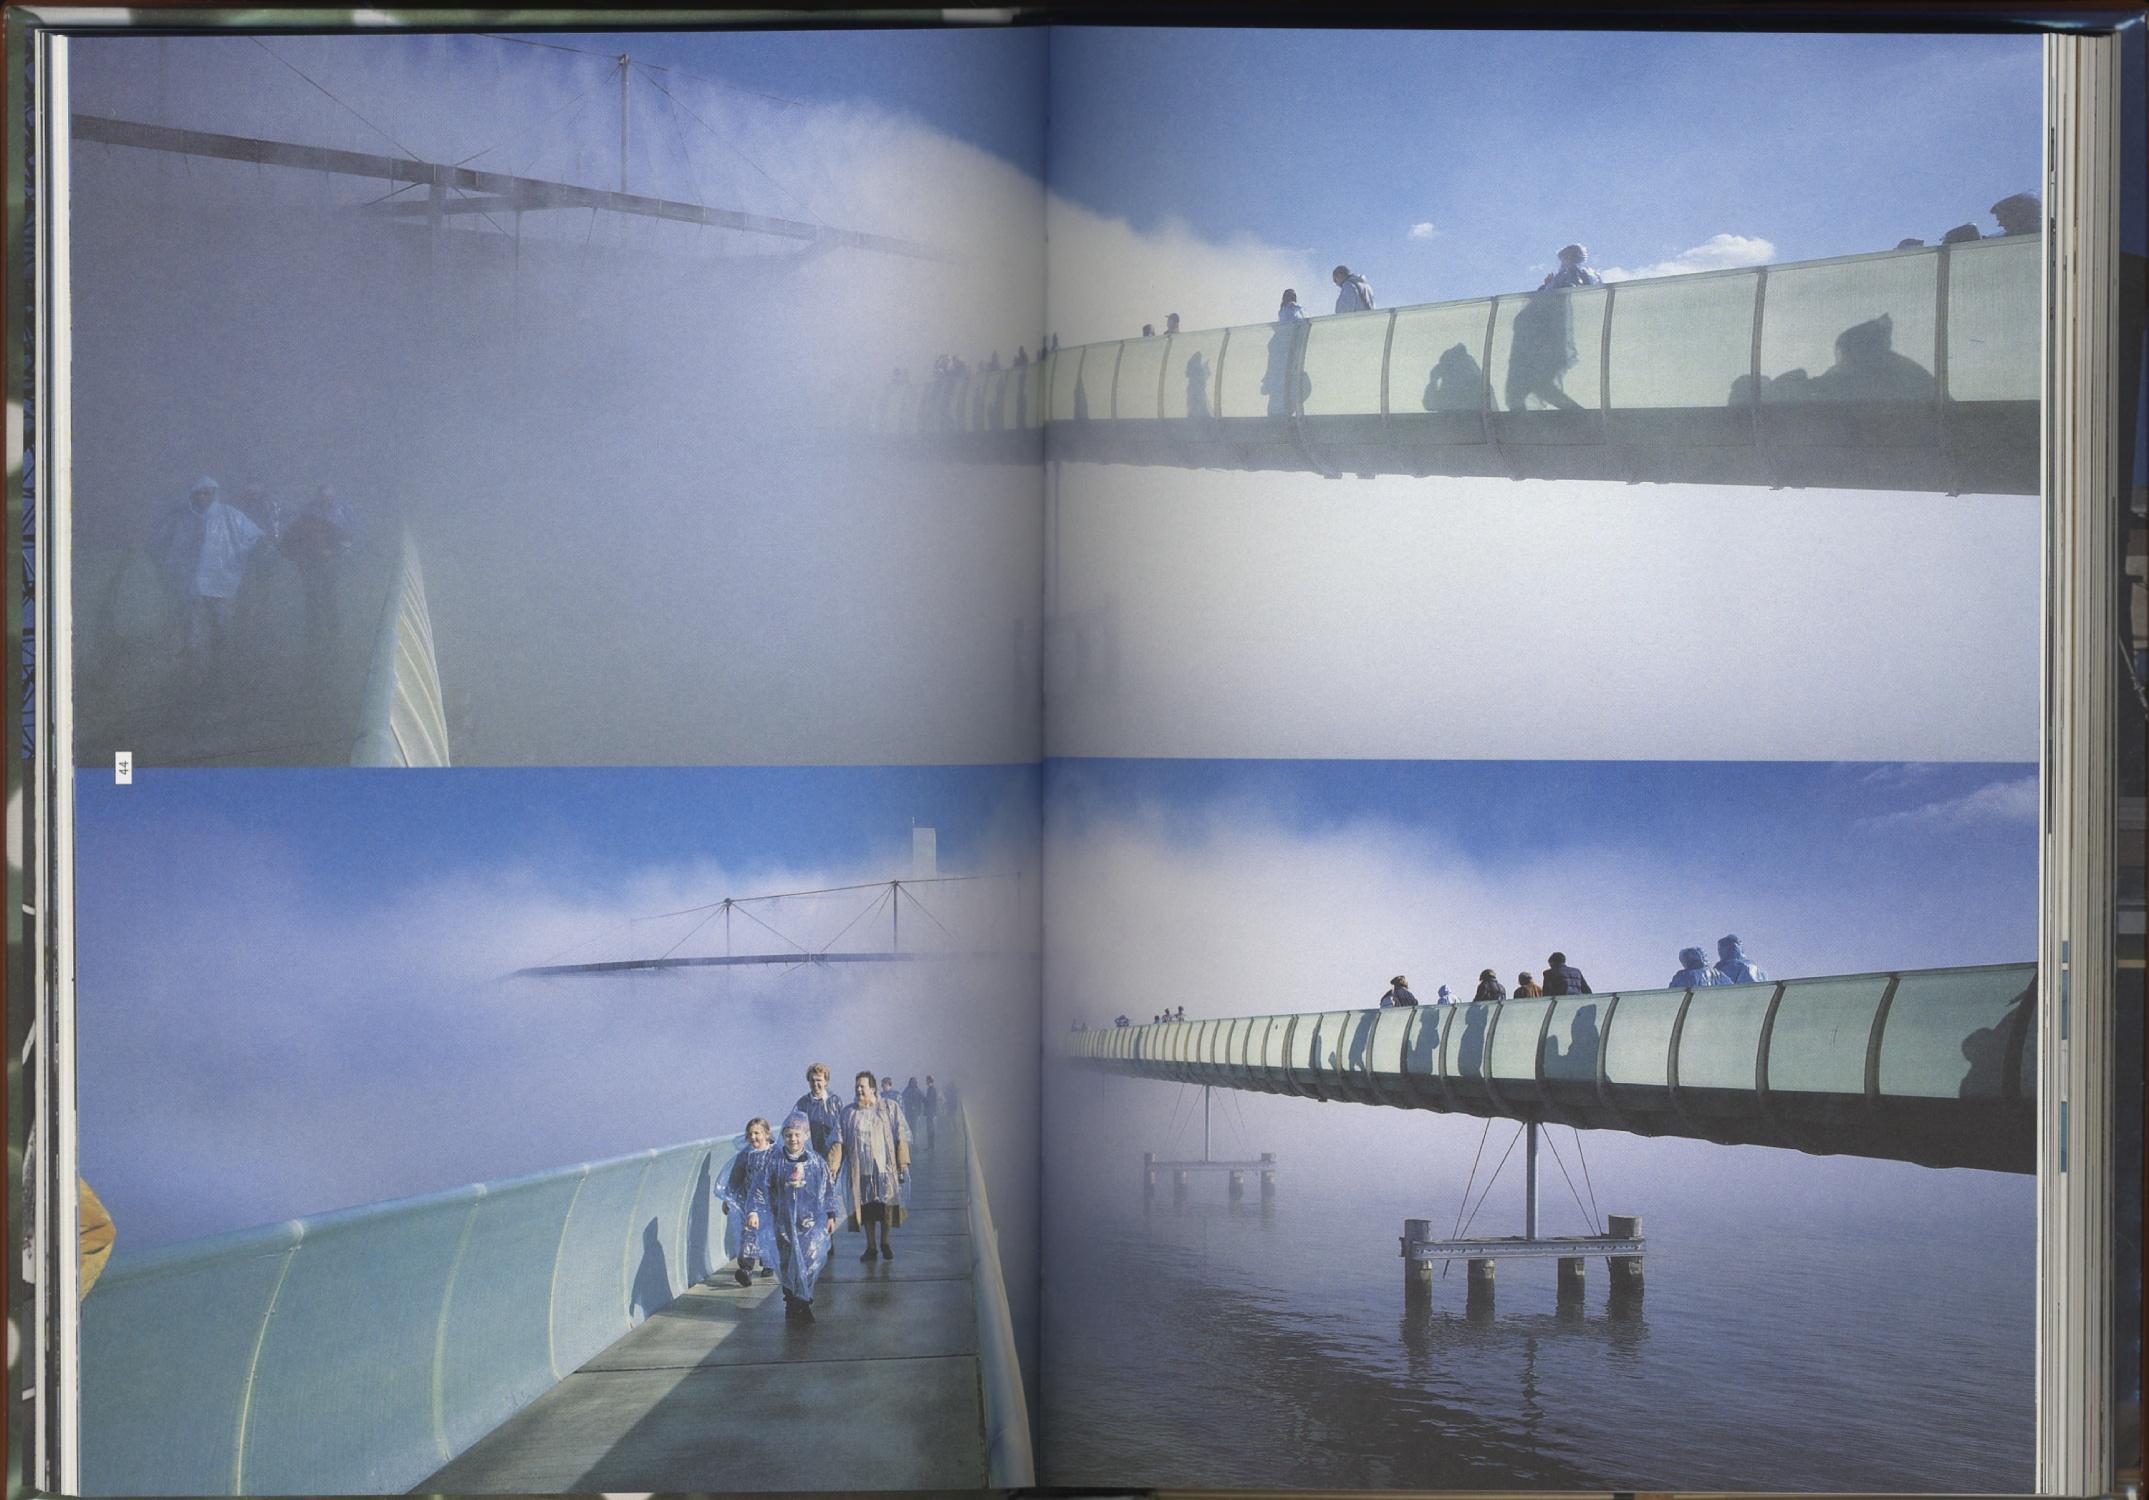 Verb Matters architecture boogazine[image2]